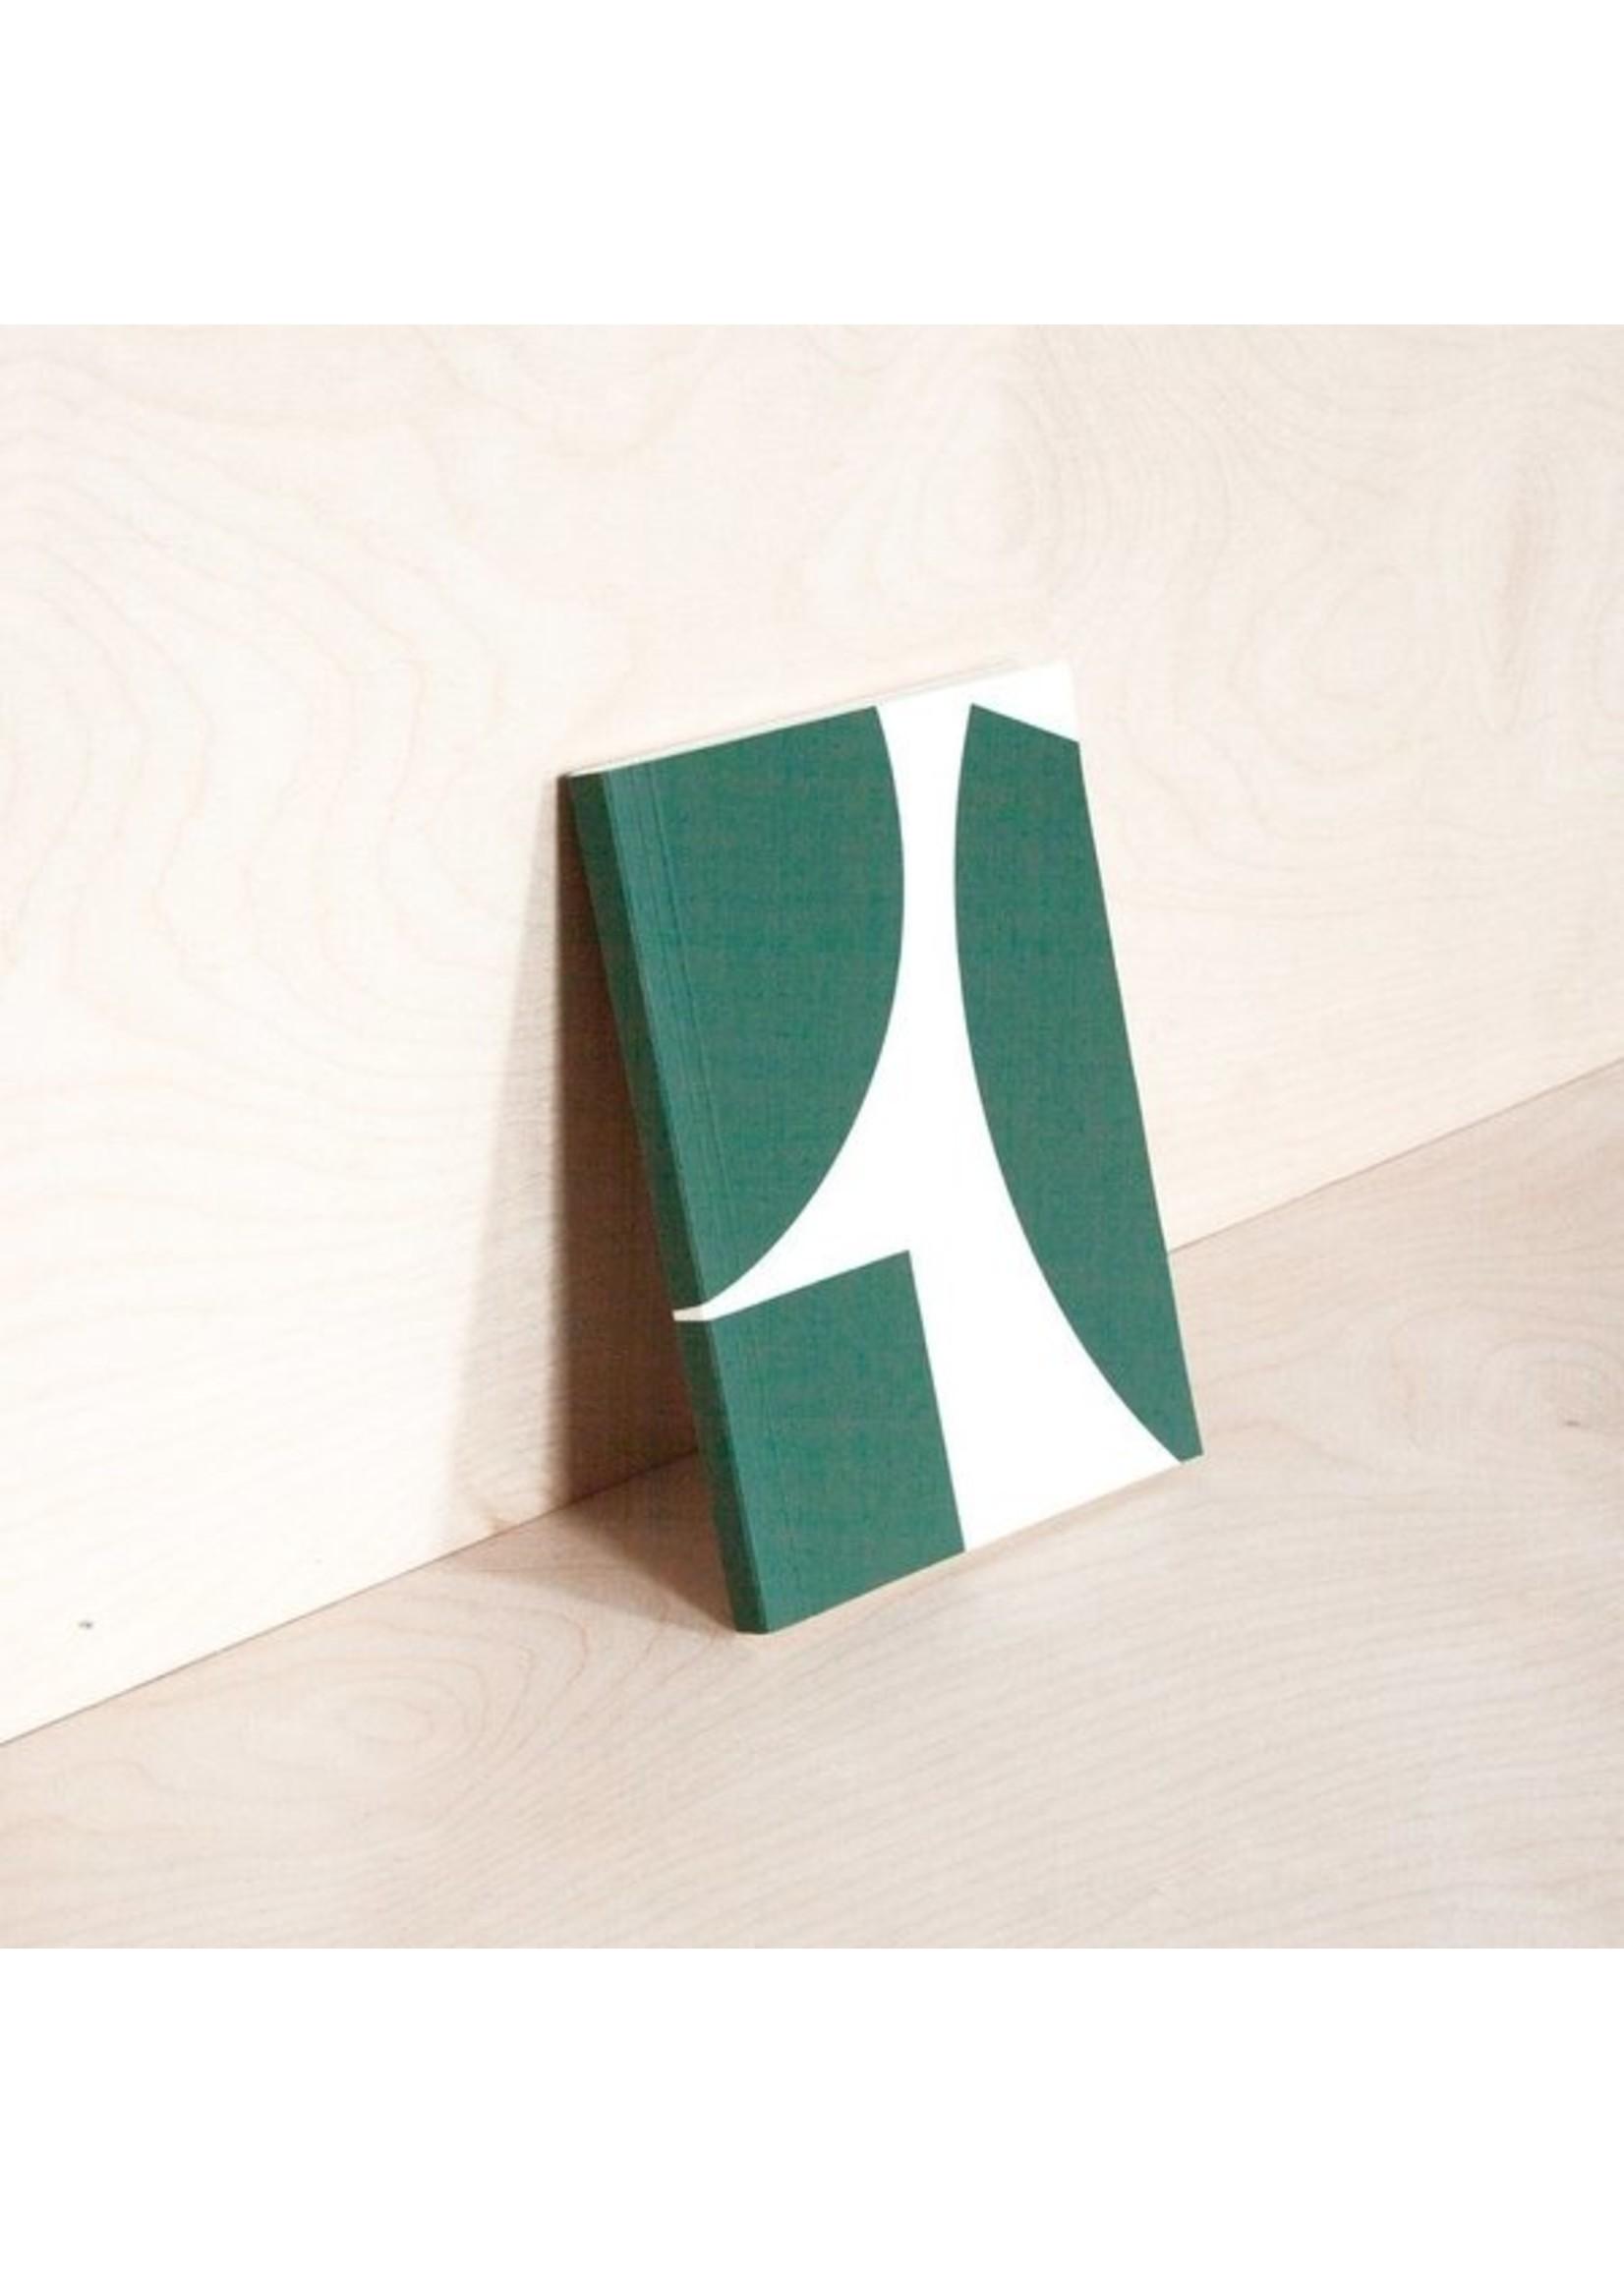 Ola Ola *Limited Edition* Medium Layflat Weekly Planner, Blocks Print in Green - Calendar Insert: 2021/2022